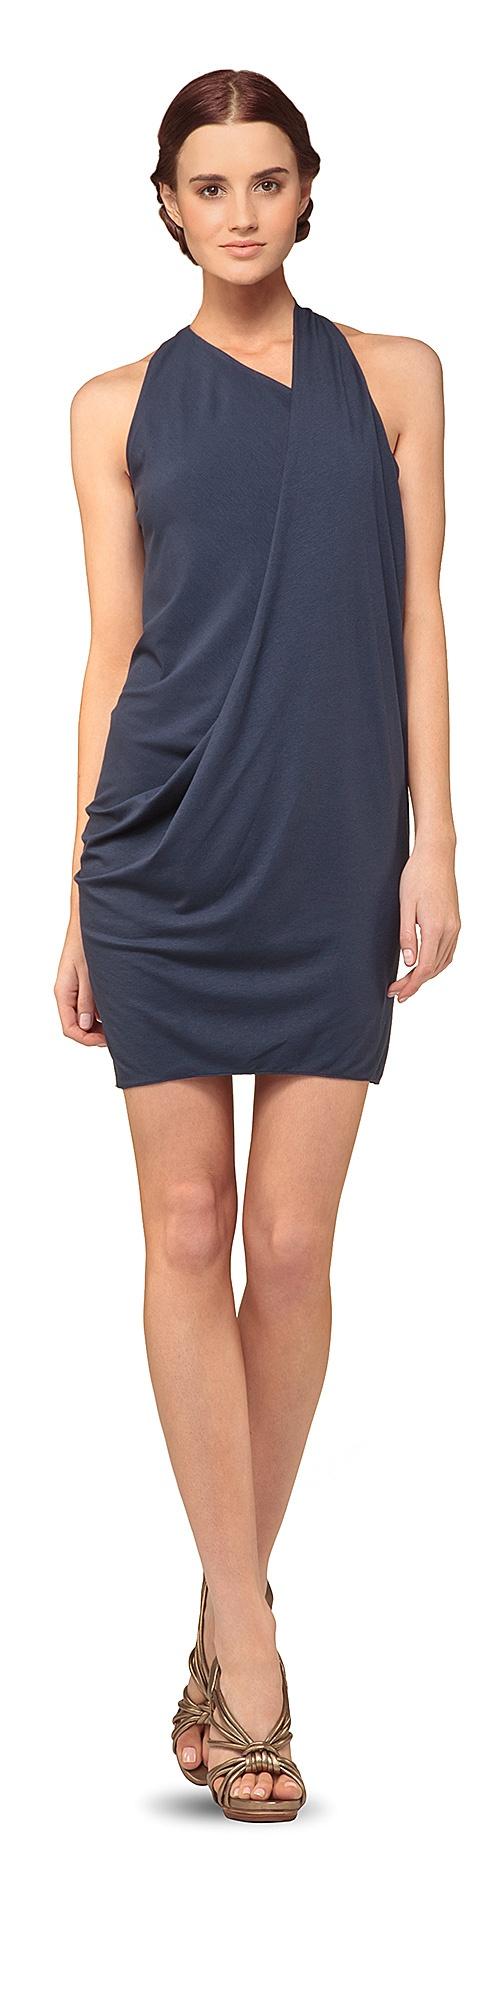 Asymmetrical Dress - MAX STUDIO